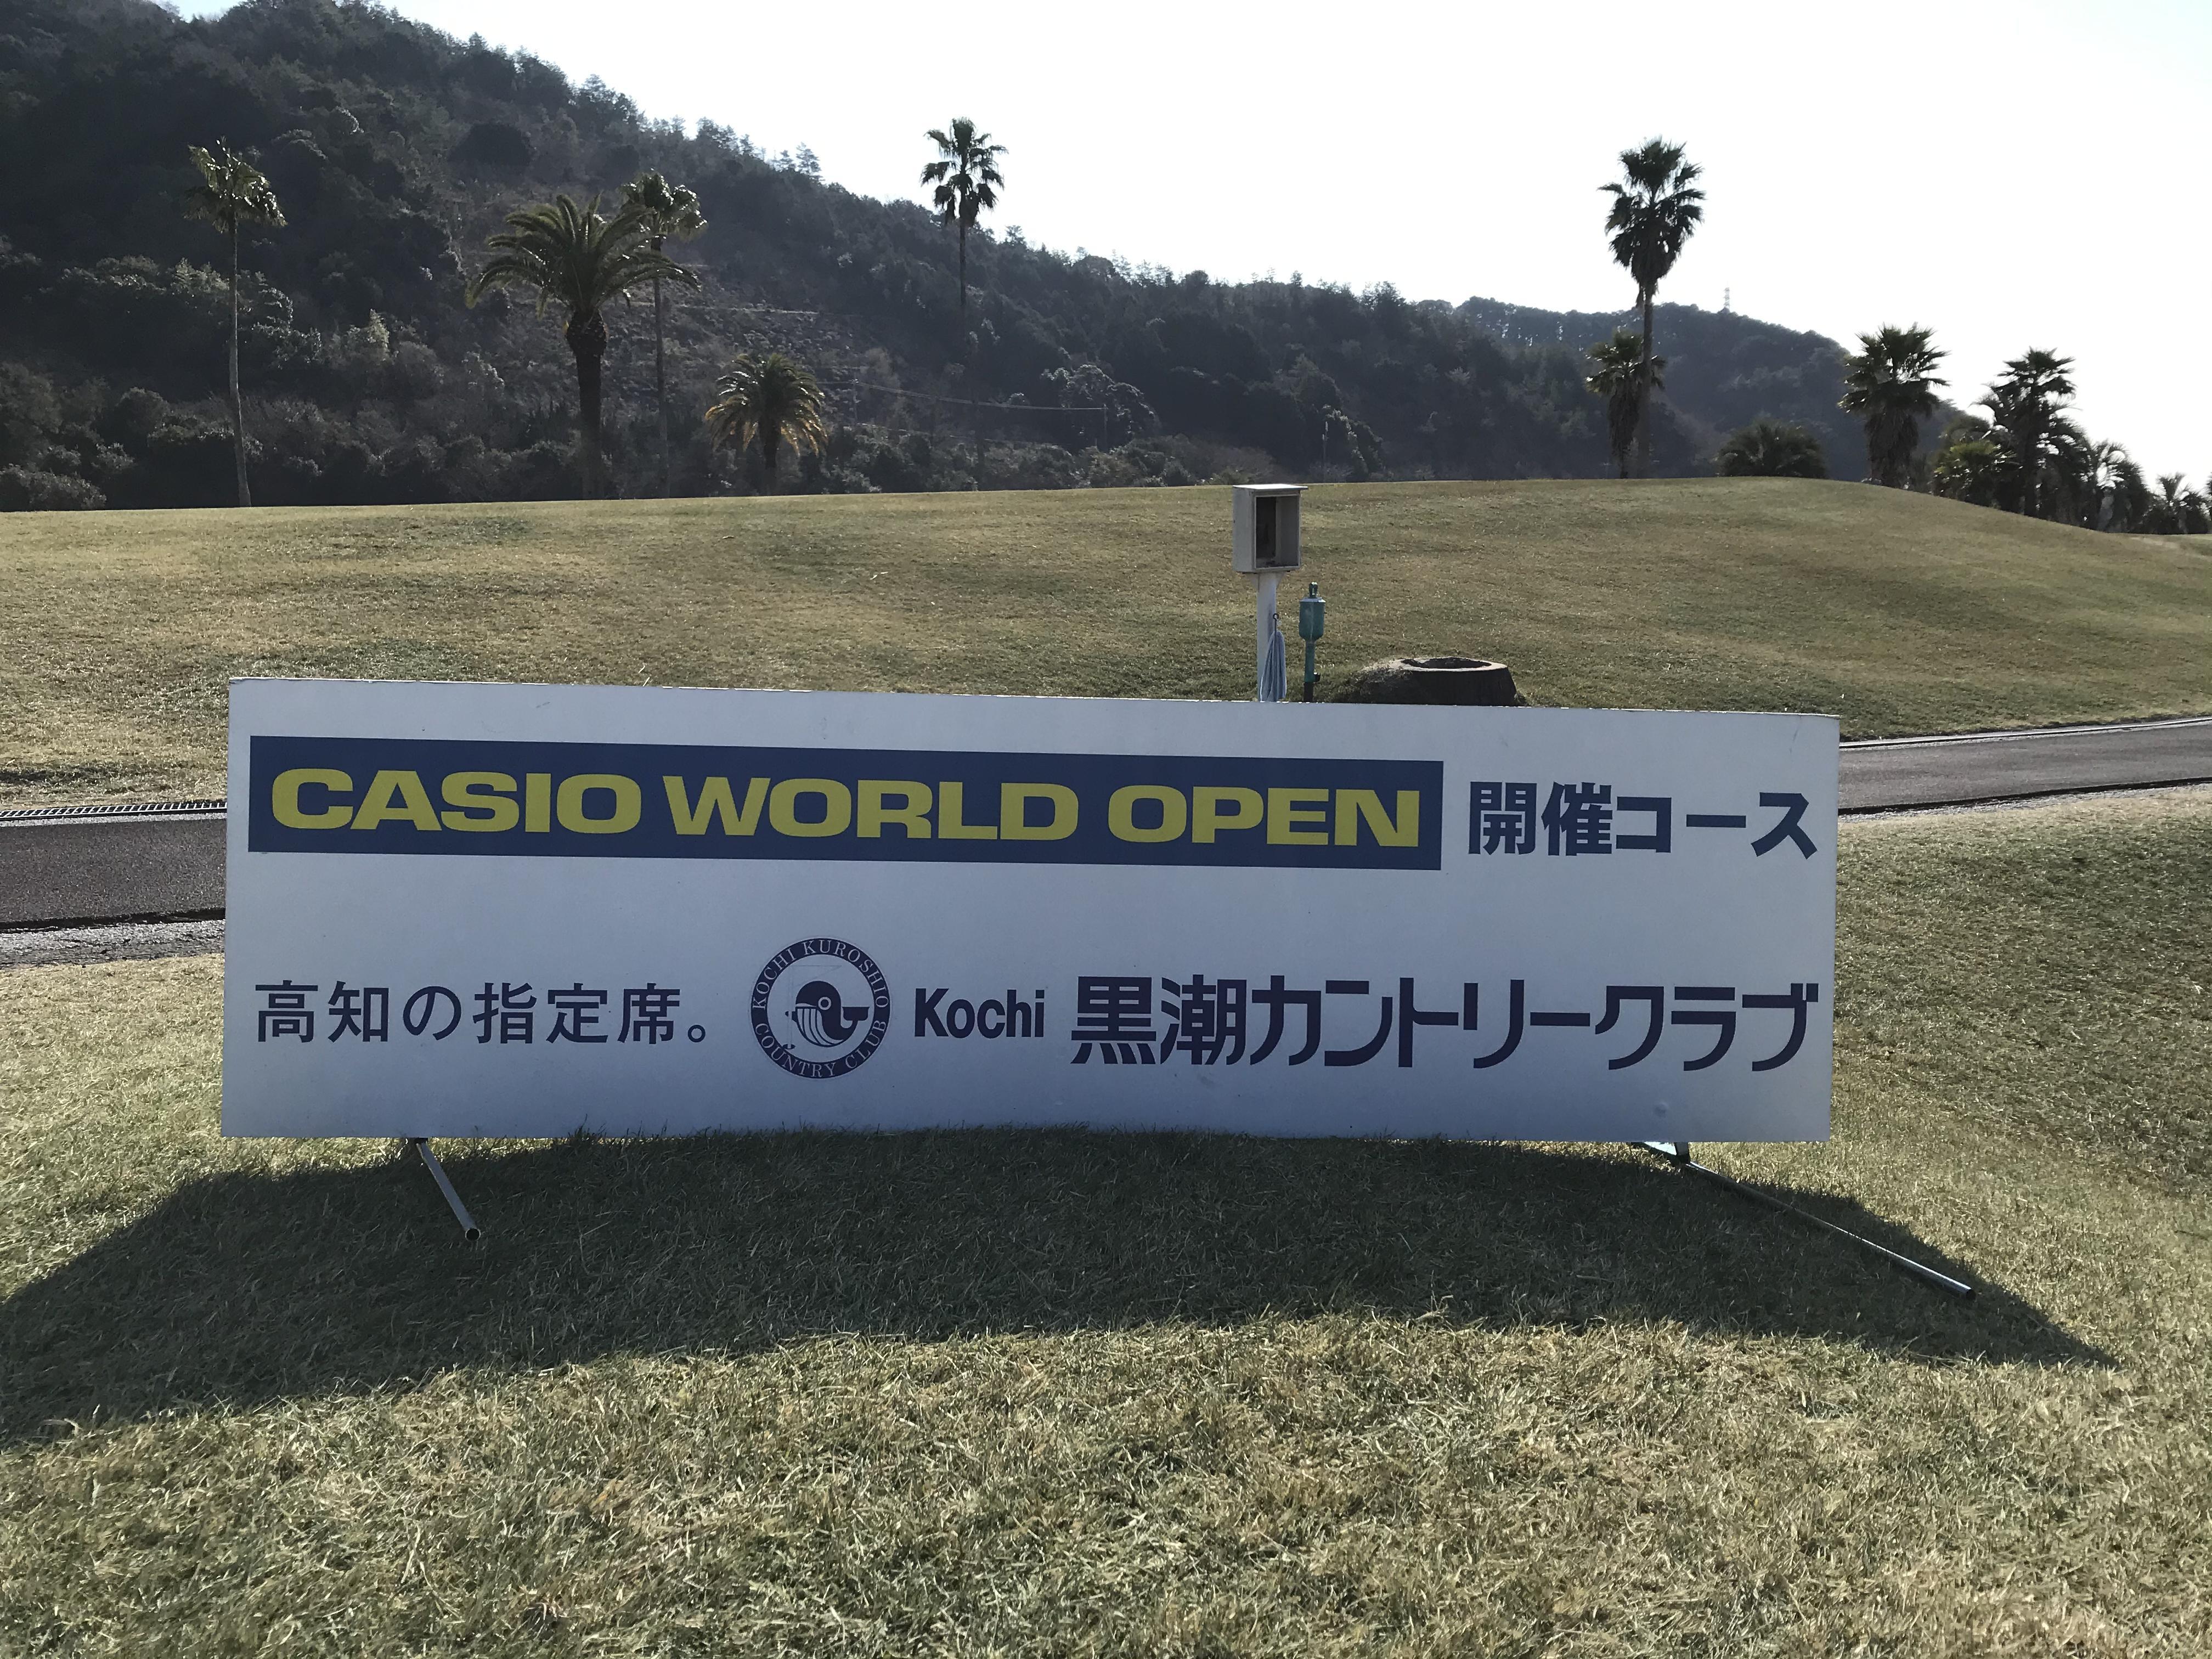 http://shikoku.misawa.co.jp/area_kouchi/5bc67ae3c3746122c7f02a006b43ec4afb10b95c.jpeg